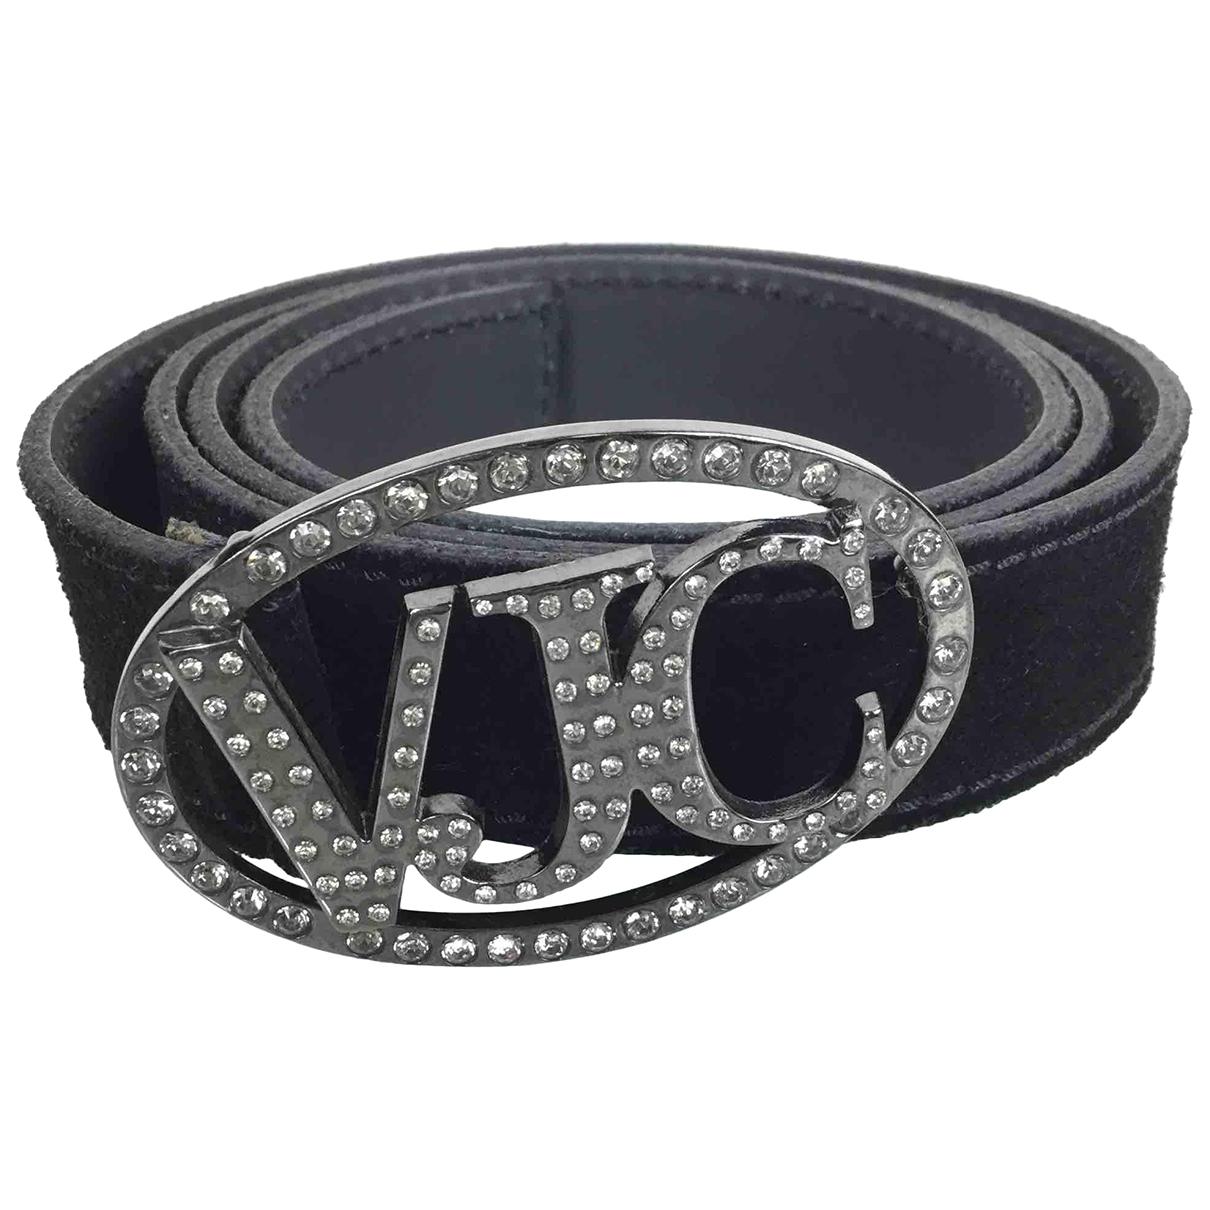 Versace \N Silver Leather belt for Women 95 cm